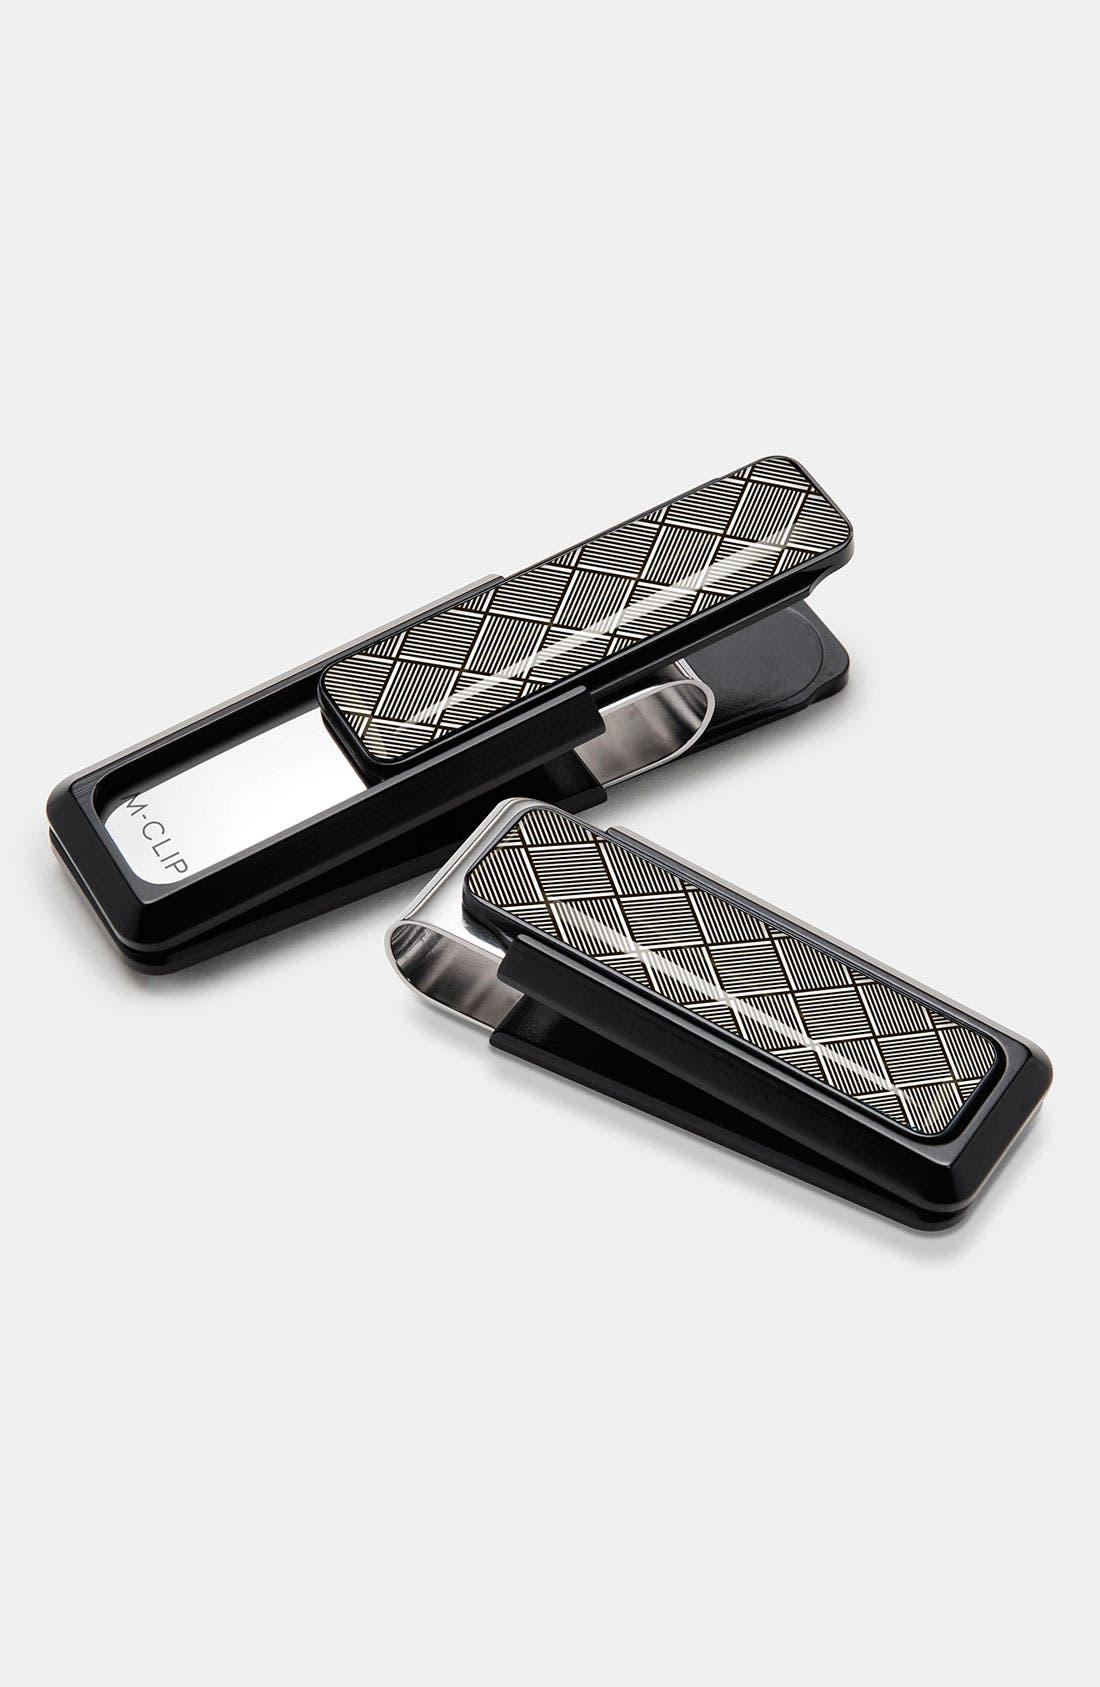 M-Clip® 'Ultralight' Money Clip